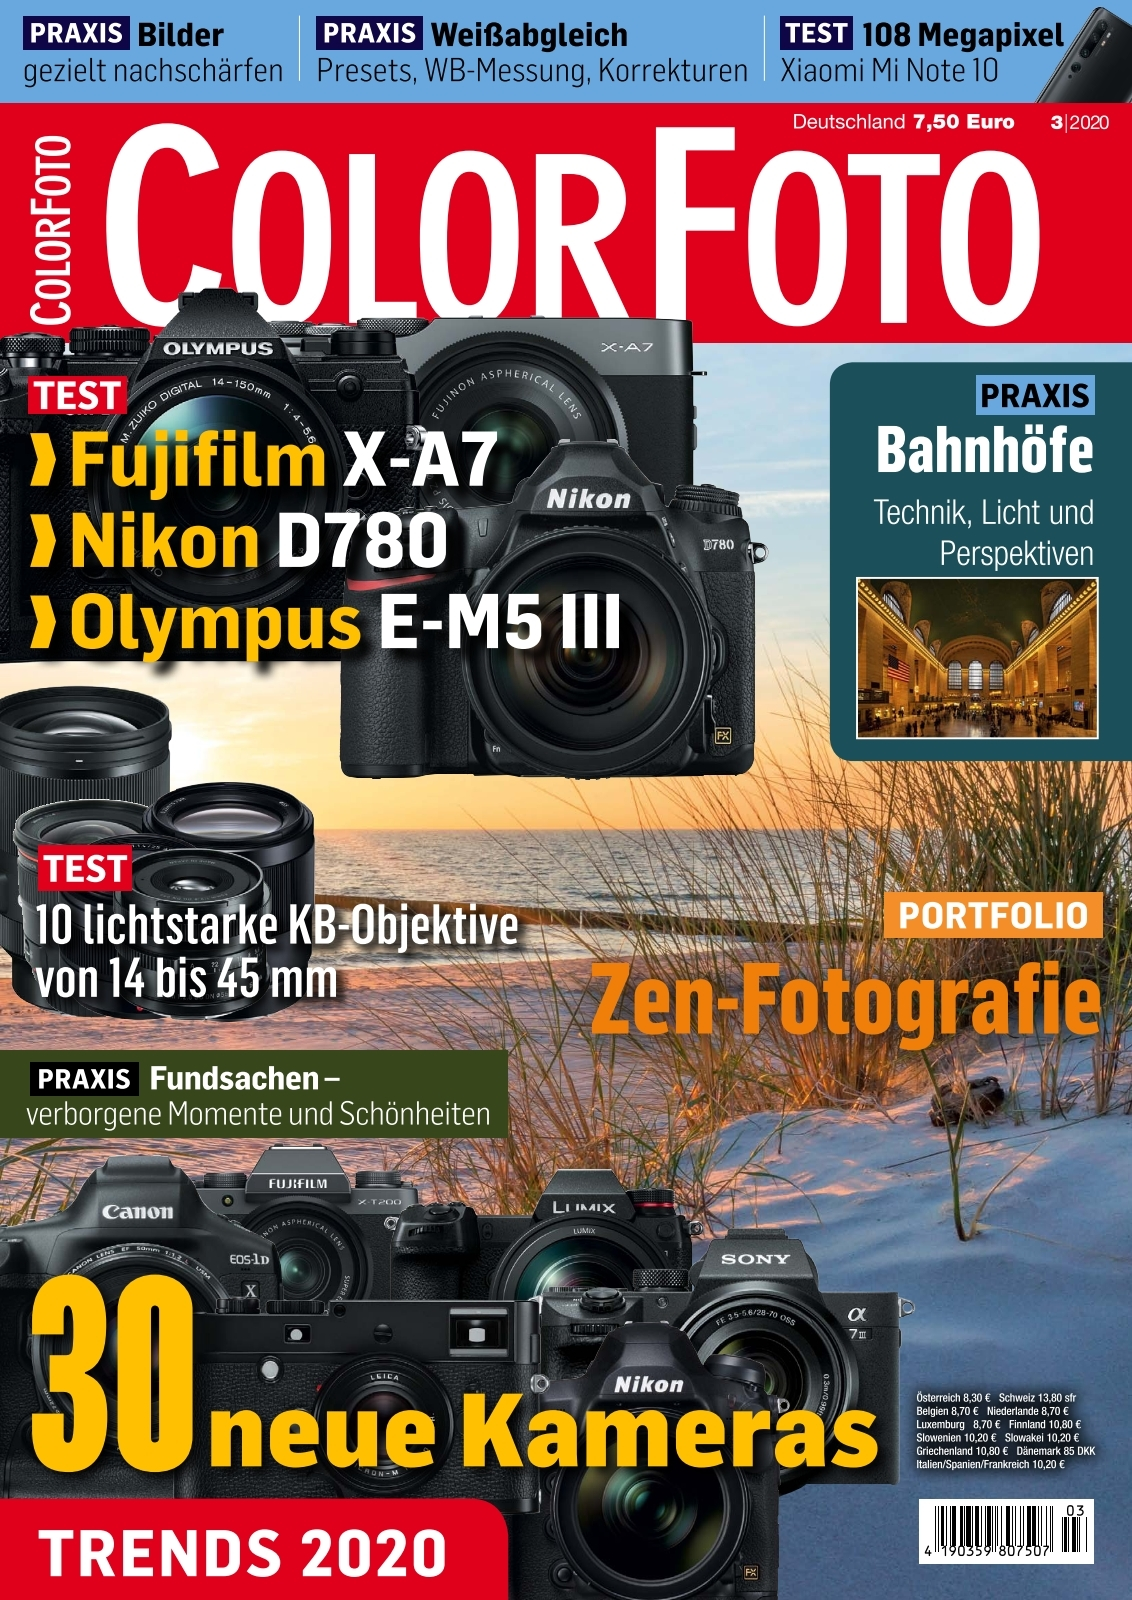 Leica SL Orig USB-STICK Leica Das Wesentliche !Classic-Camera-Store-Dresden